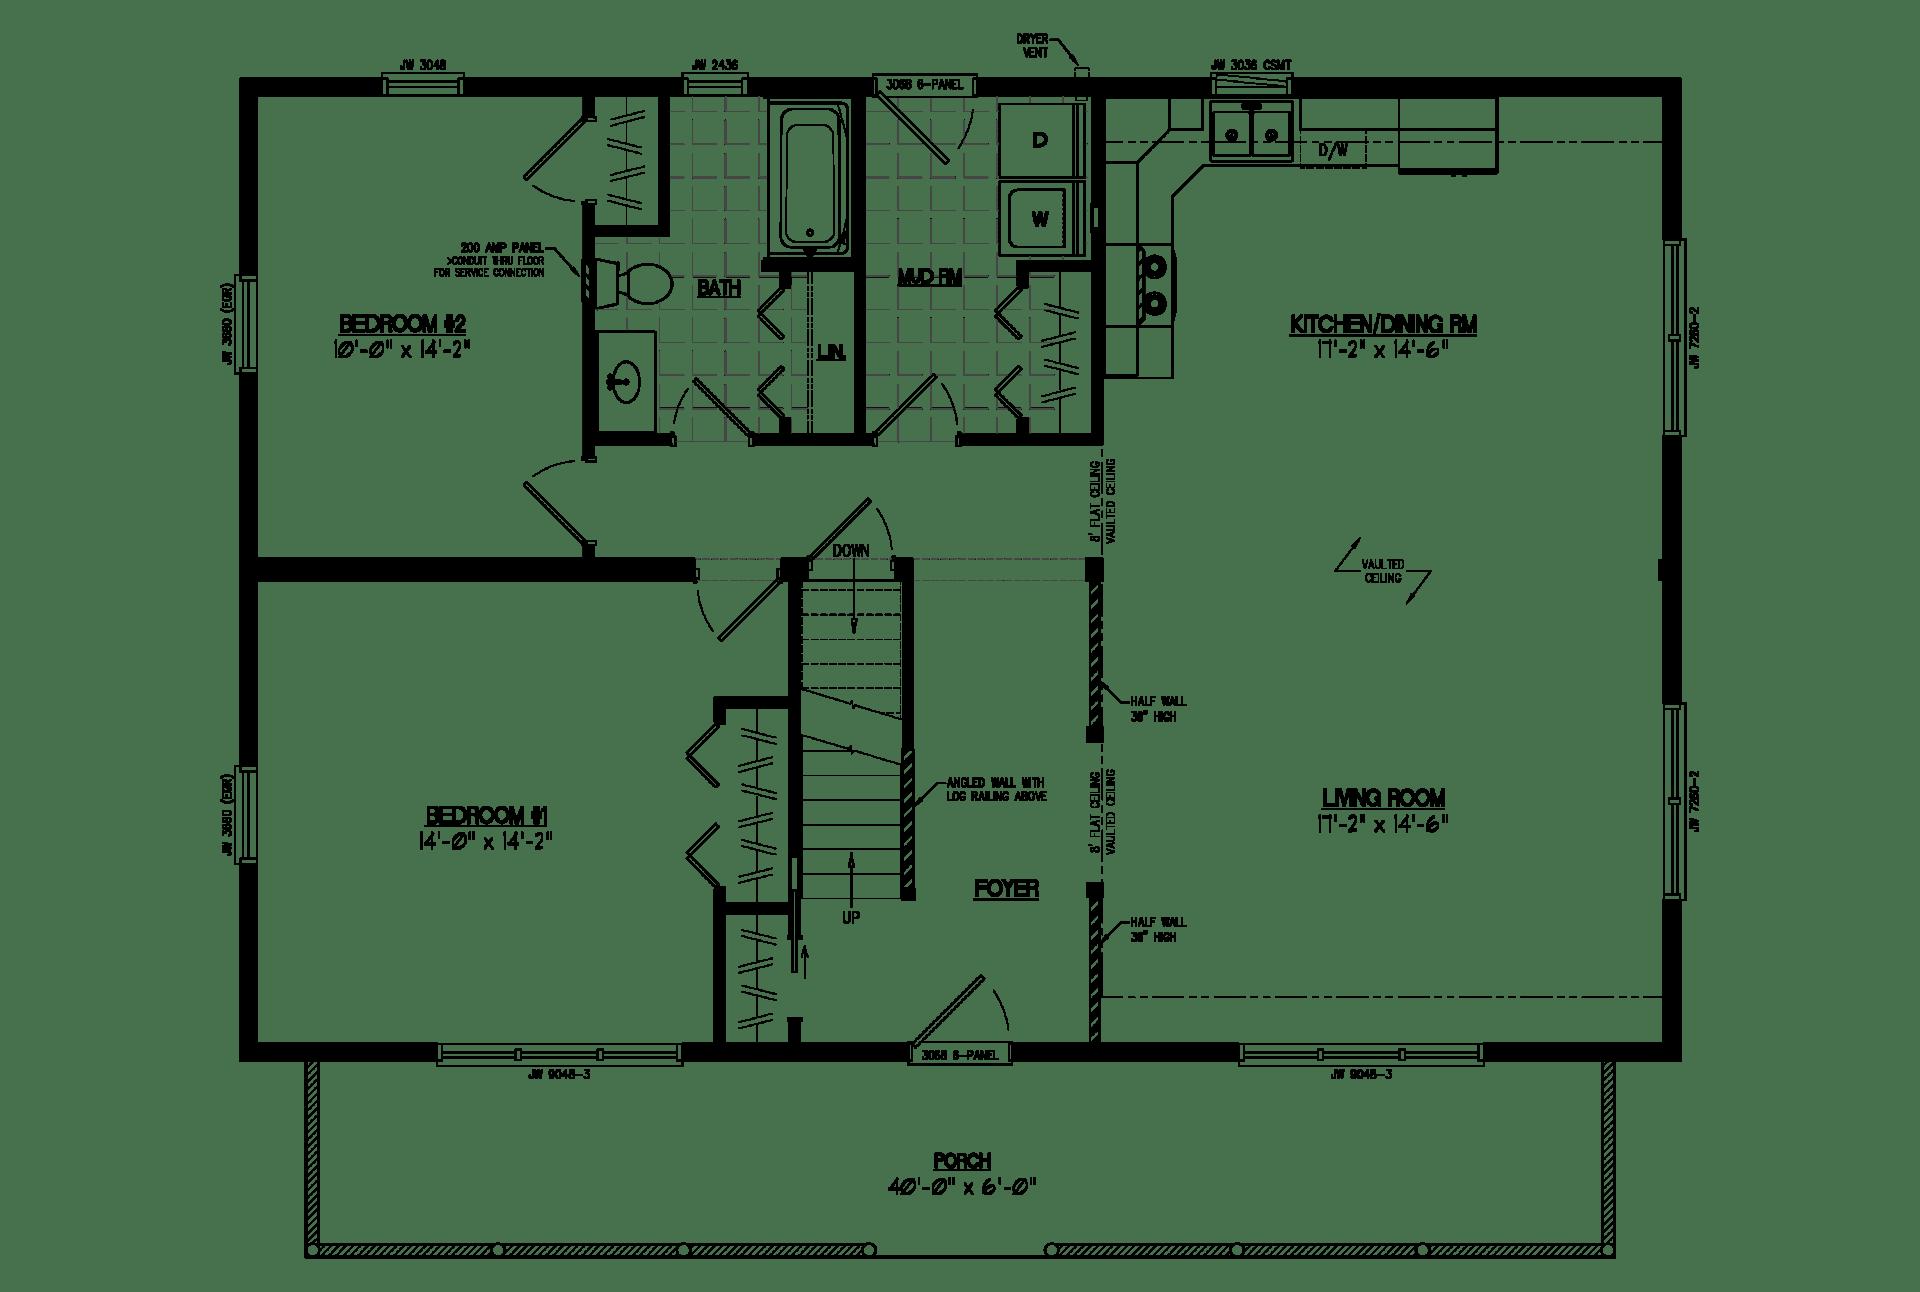 New cape cod floor plans with loft house floor ideas for Cape cod floor plans with loft